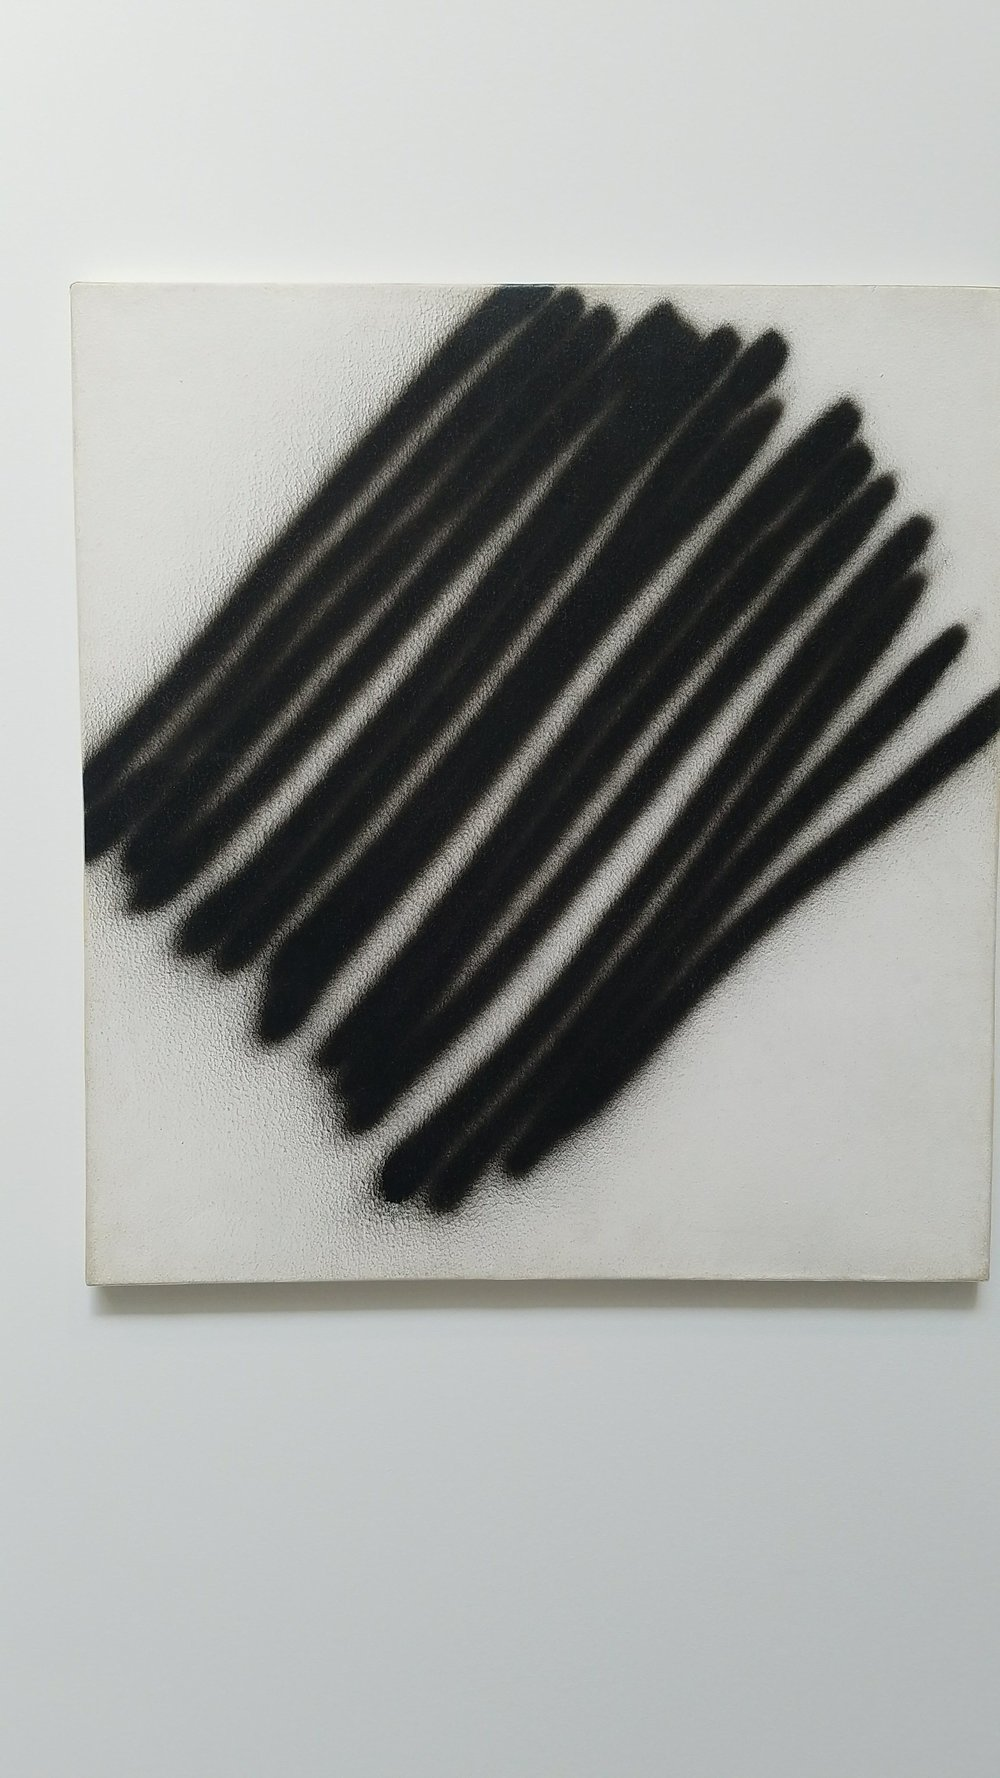 Martin Barré,  67-Z-4-53x49 , 1967, enamel & acrylic on canvas, 20 7/8 x 19 3/8 in., Courtesy Matthew Marks Gallery